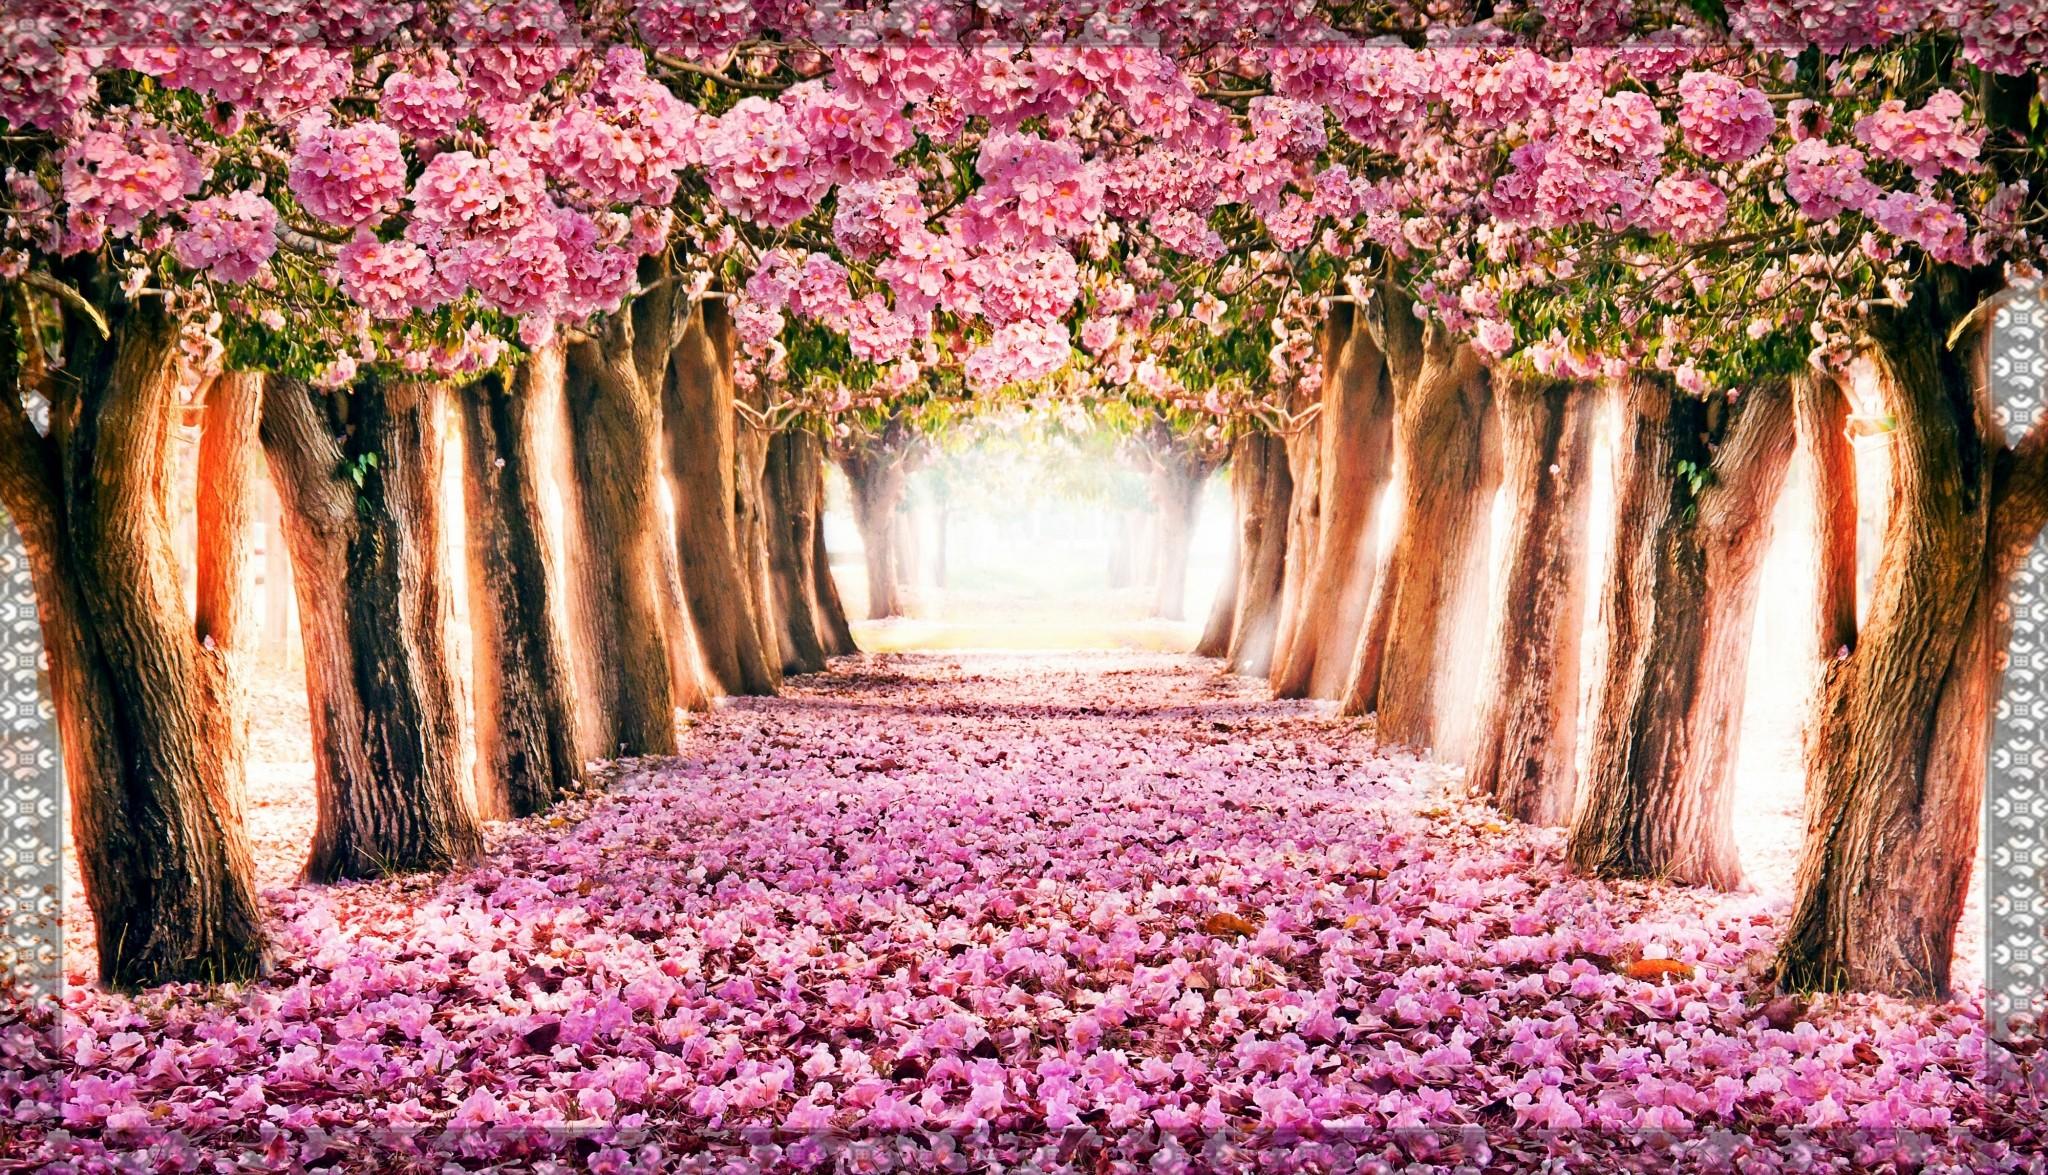 spring wallpaper computer 64 images